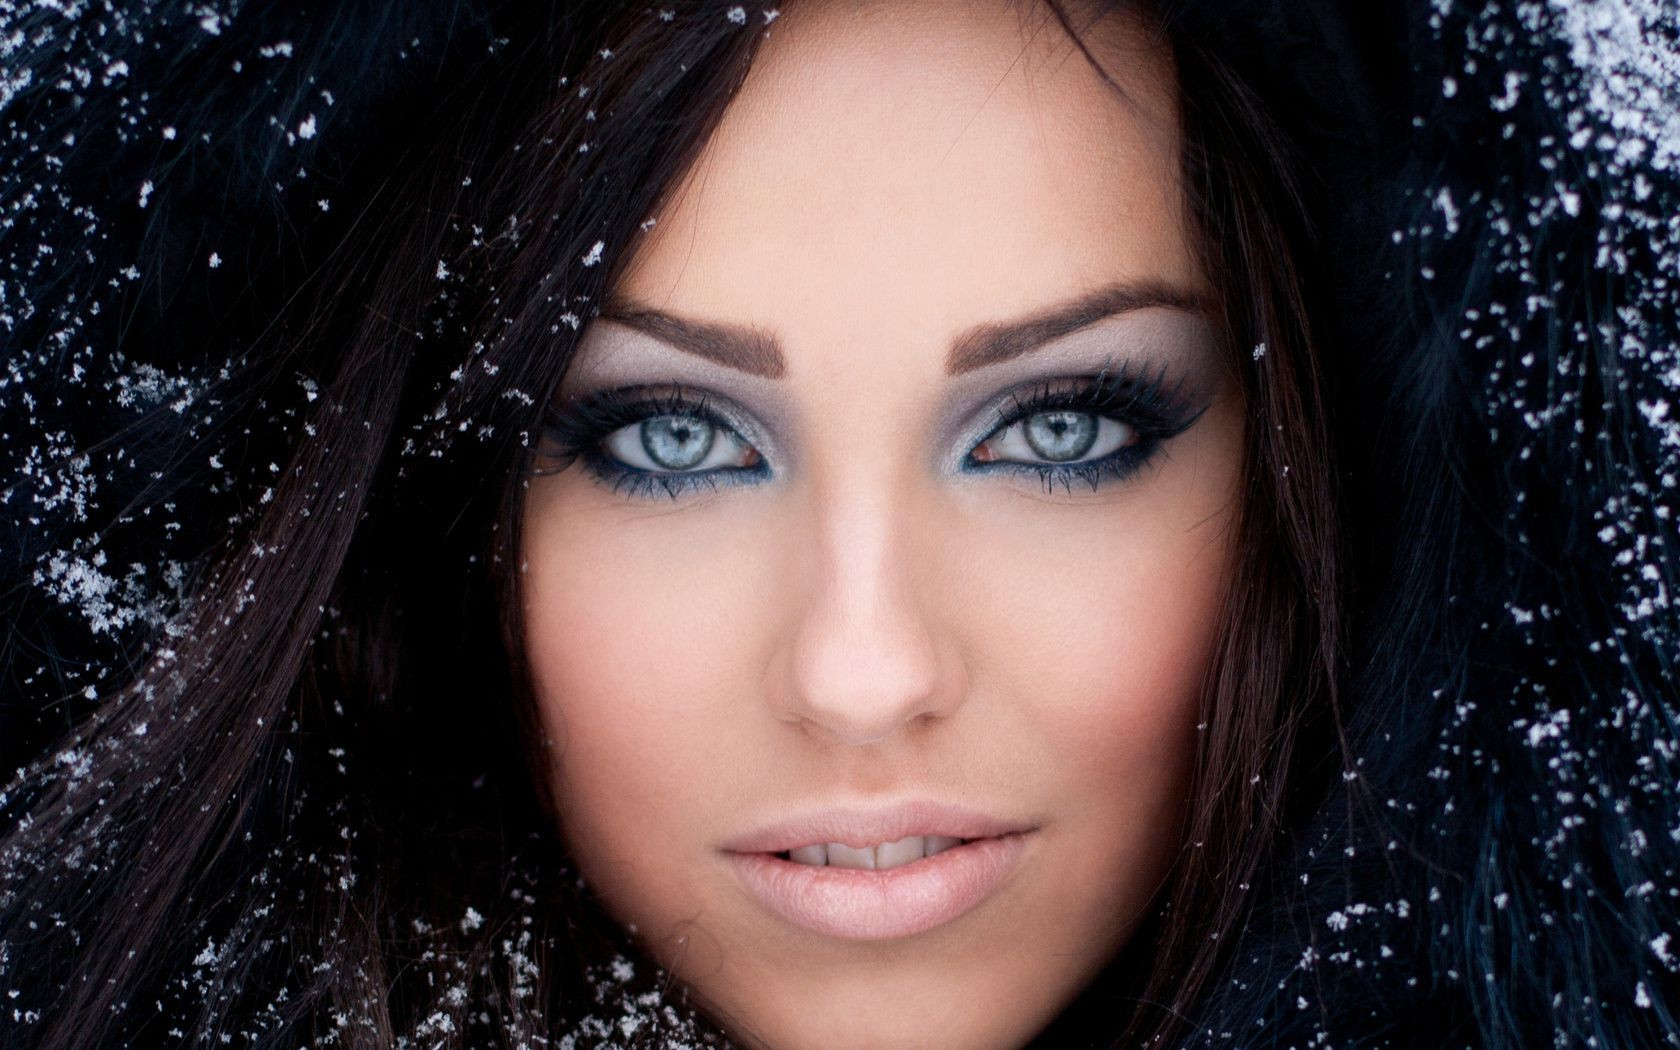 Глаза брюнетка лицо девушка